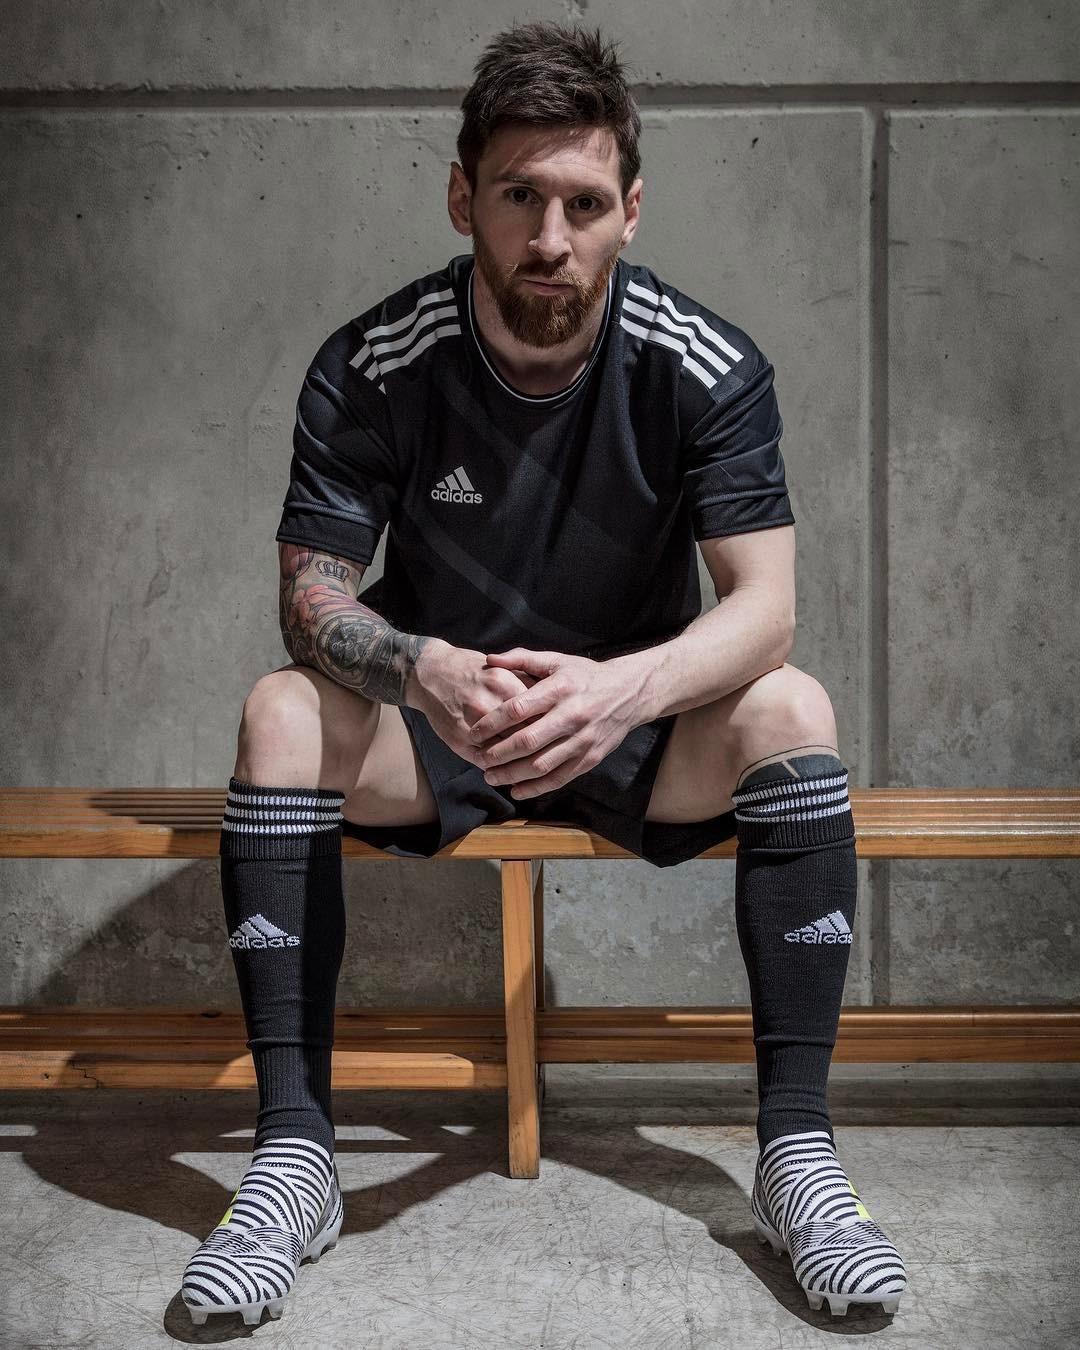 Adidas Instagram username